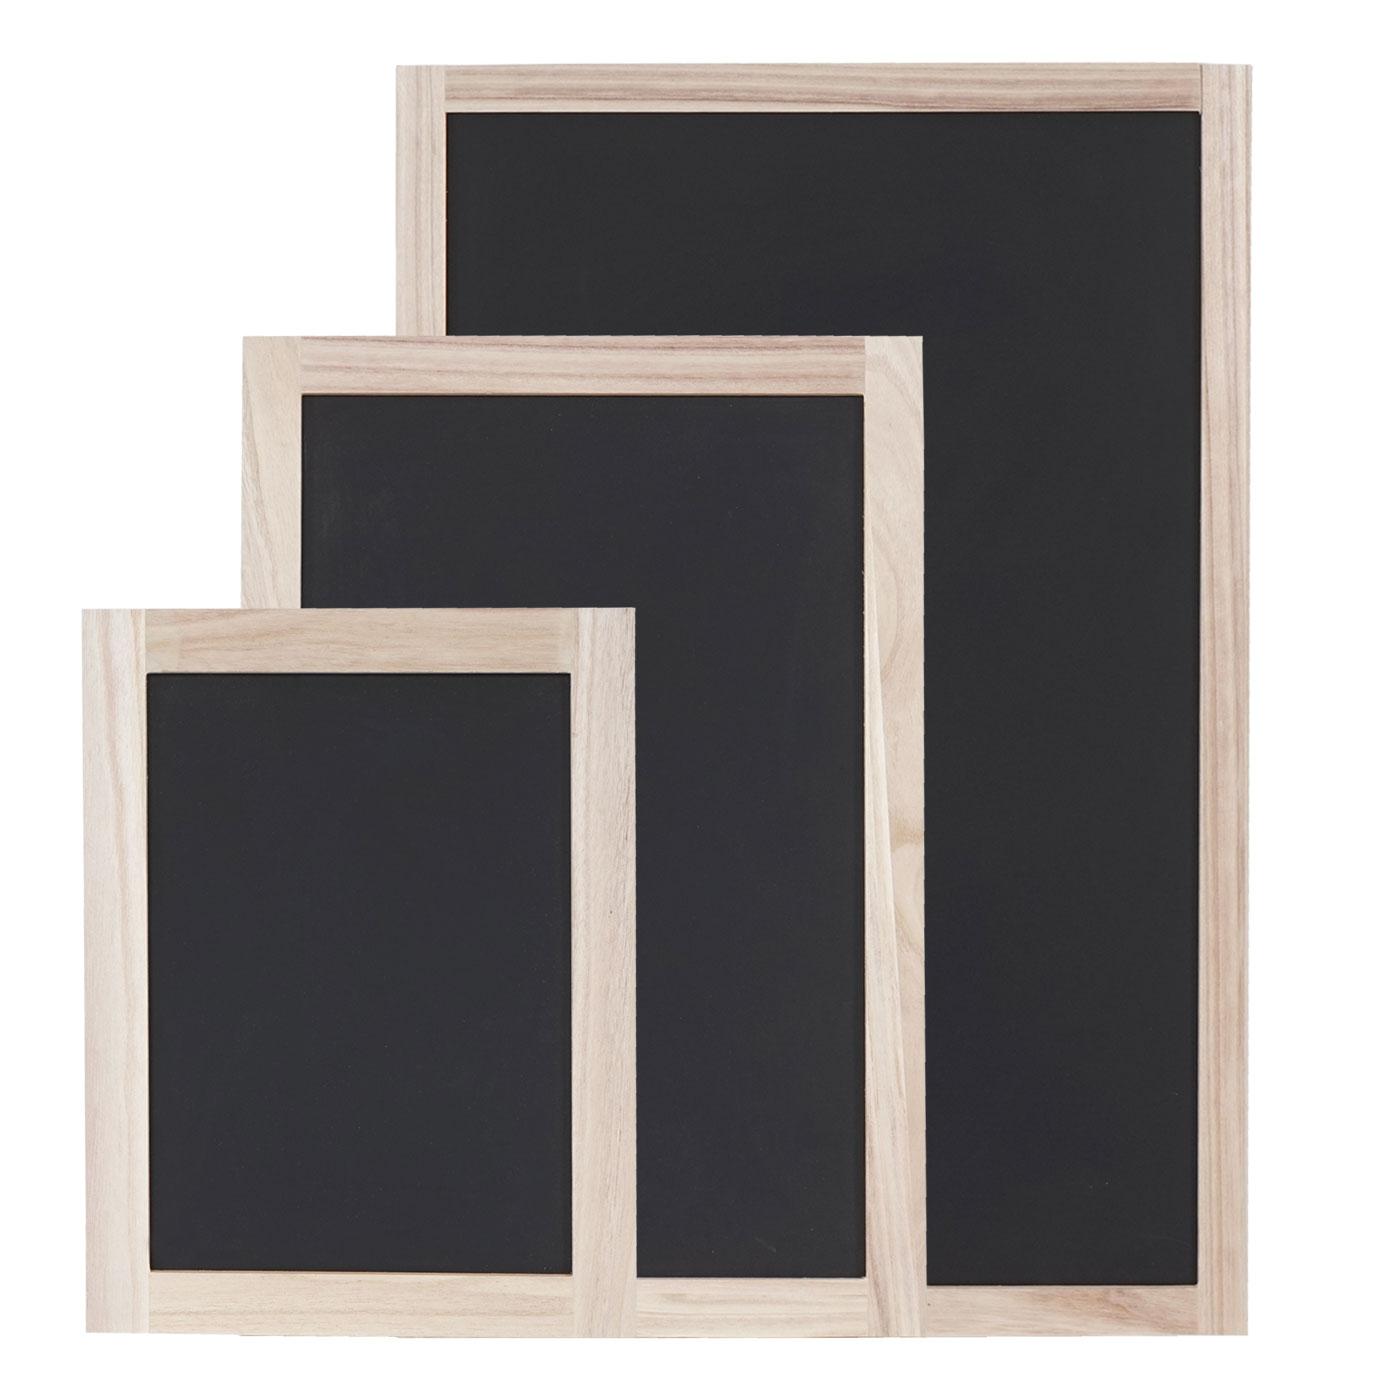 Mendler 3er Set Wandtafeln HWC-C18, Kreidetafel Schreibtafel Schiefertafel Dekotafel Notiztafel ~ Variantena 60993+60994+60995